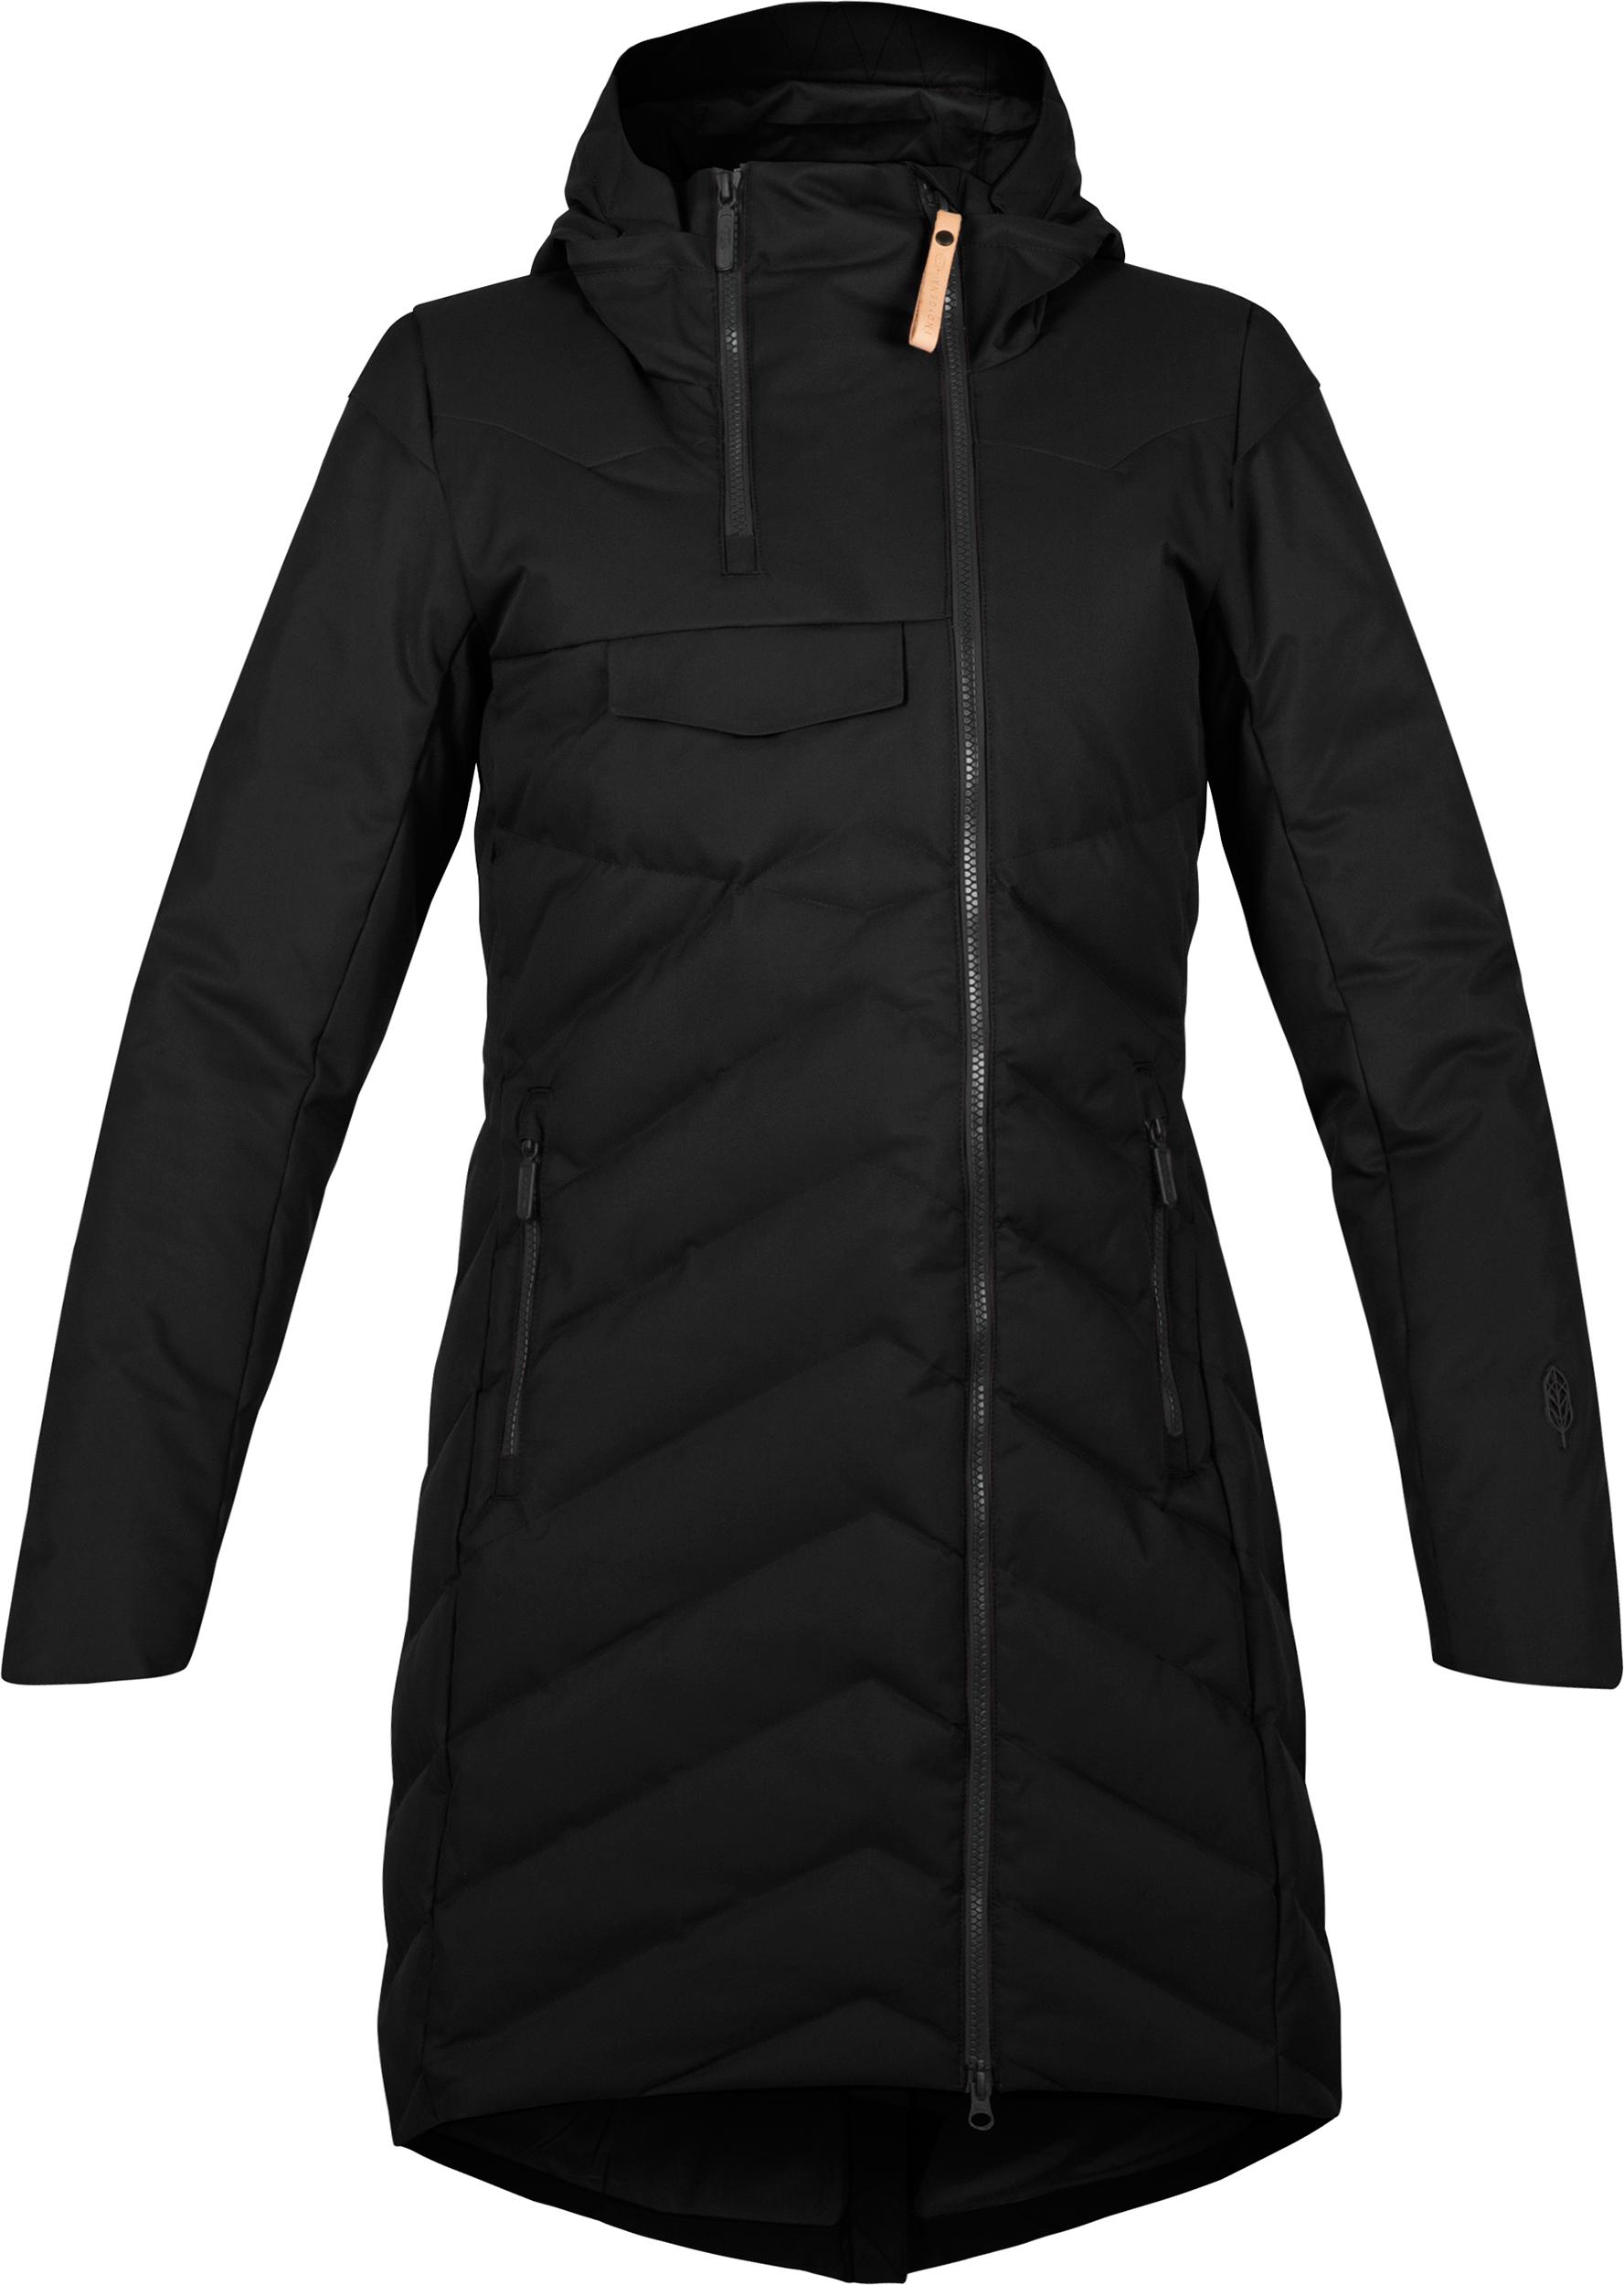 2308c810 Down jackets | MEC